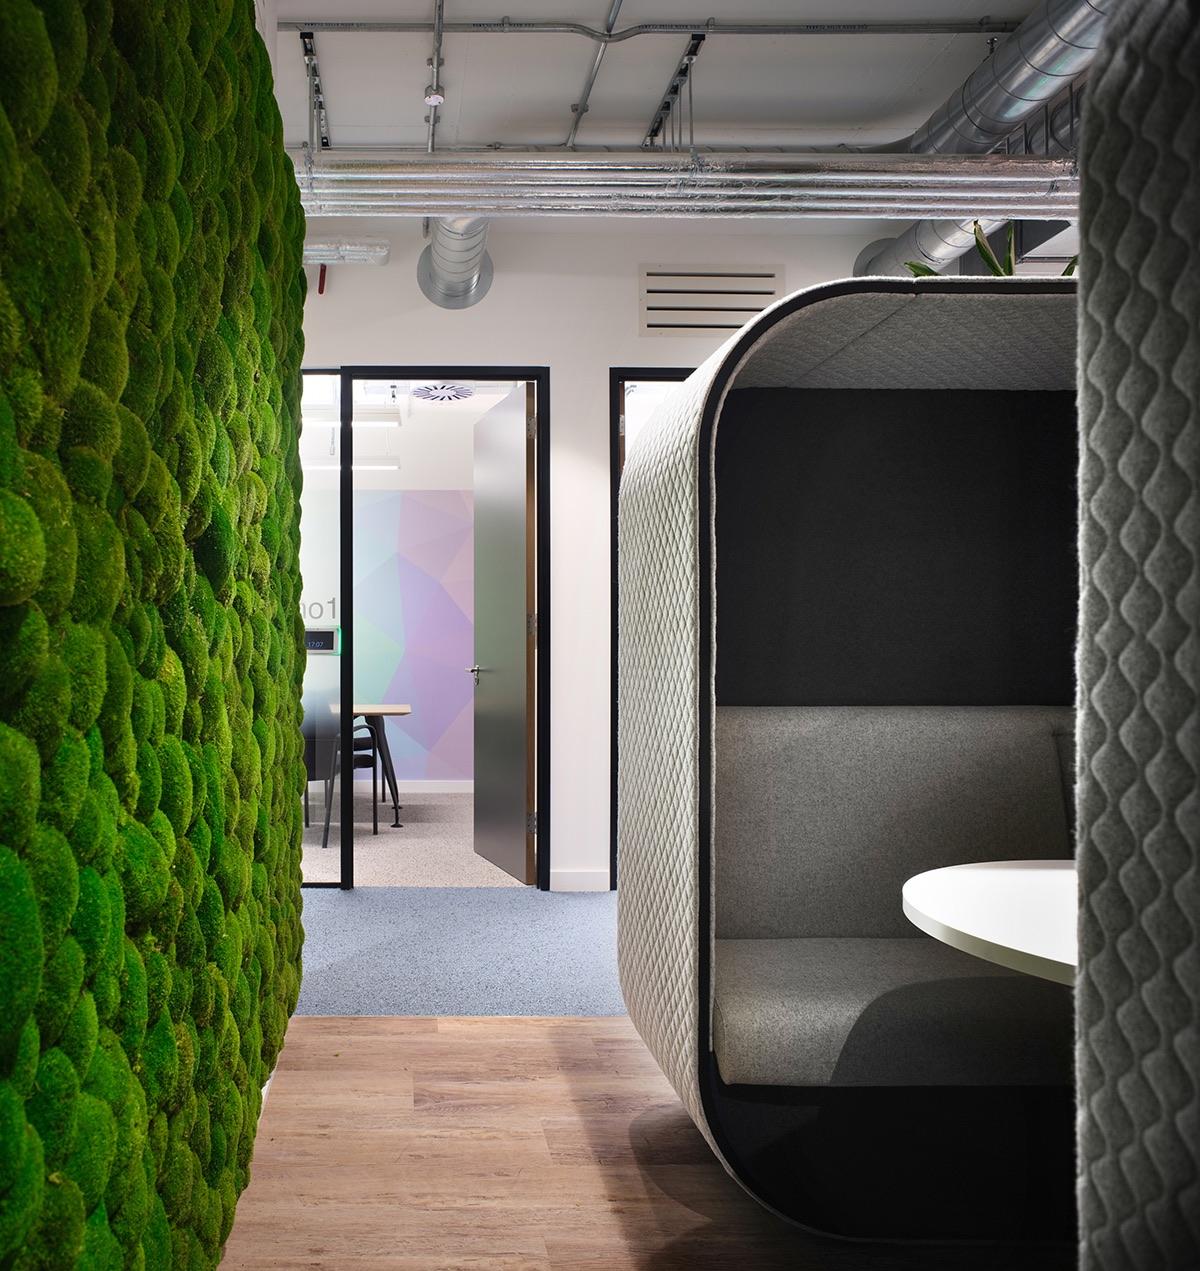 sage-publishing-london-office-13